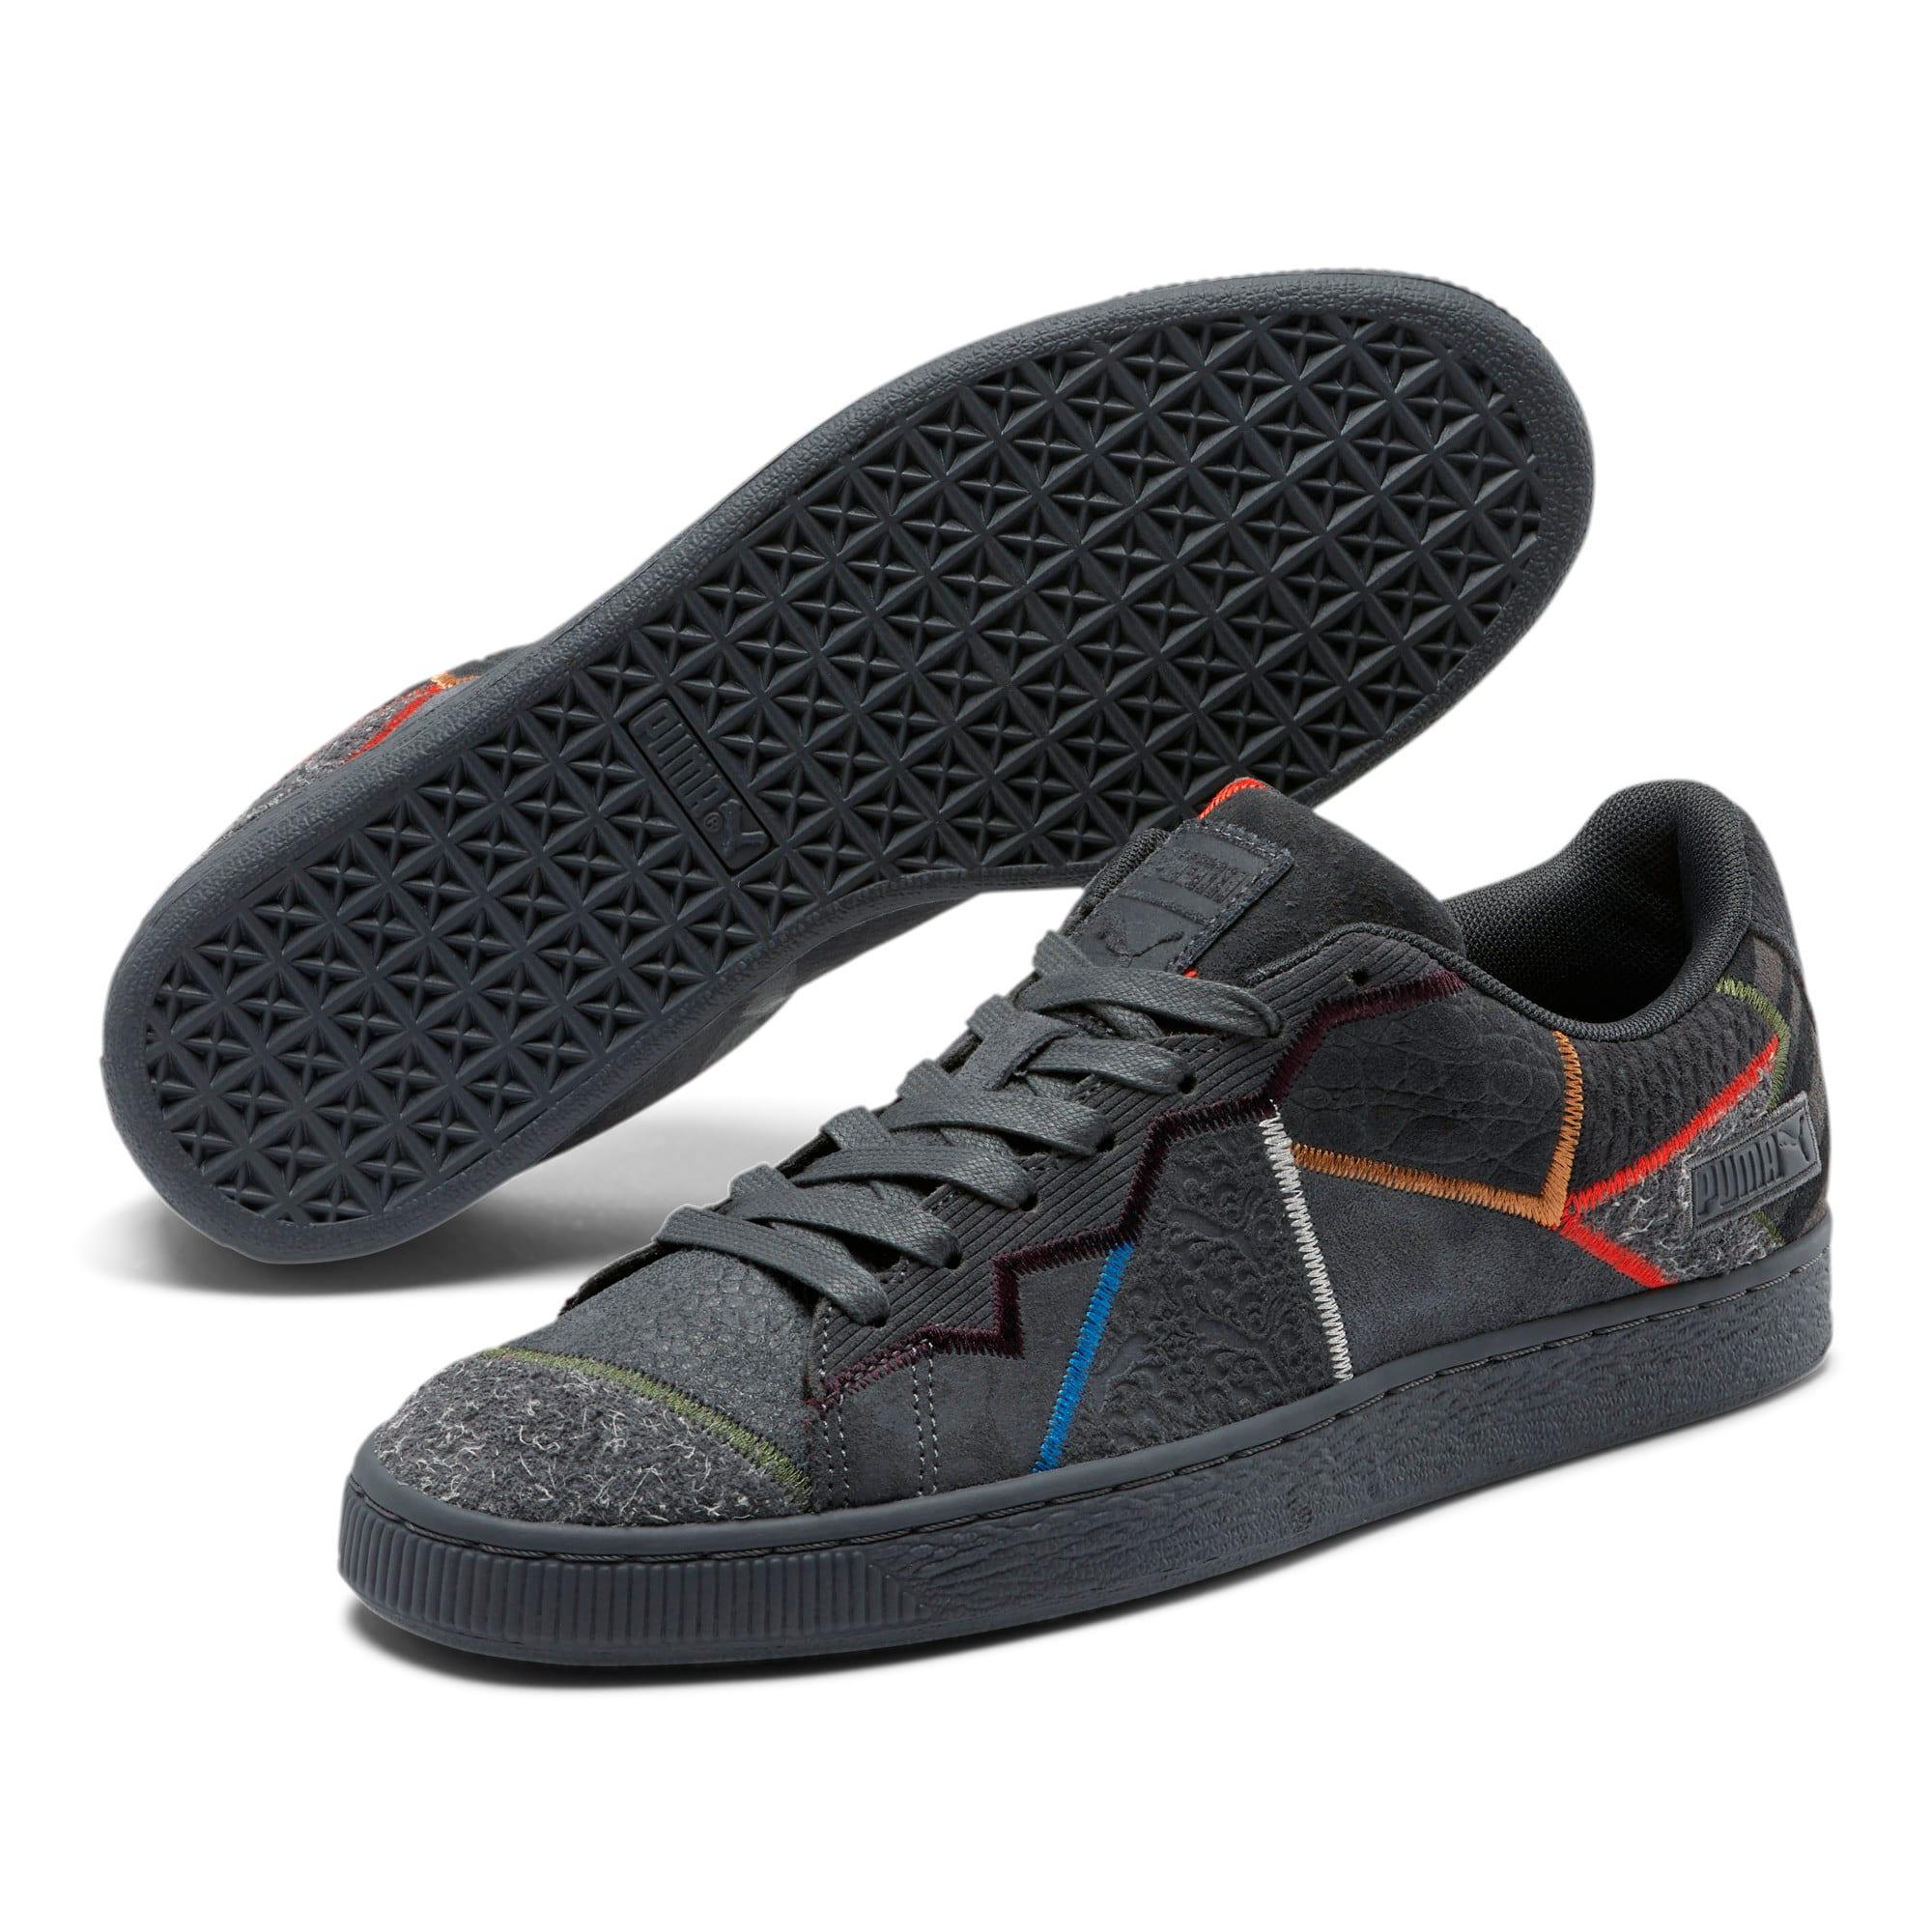 Thumbnail 2 of Suede RP Fashion Geek Sneakers, Asphalt, medium